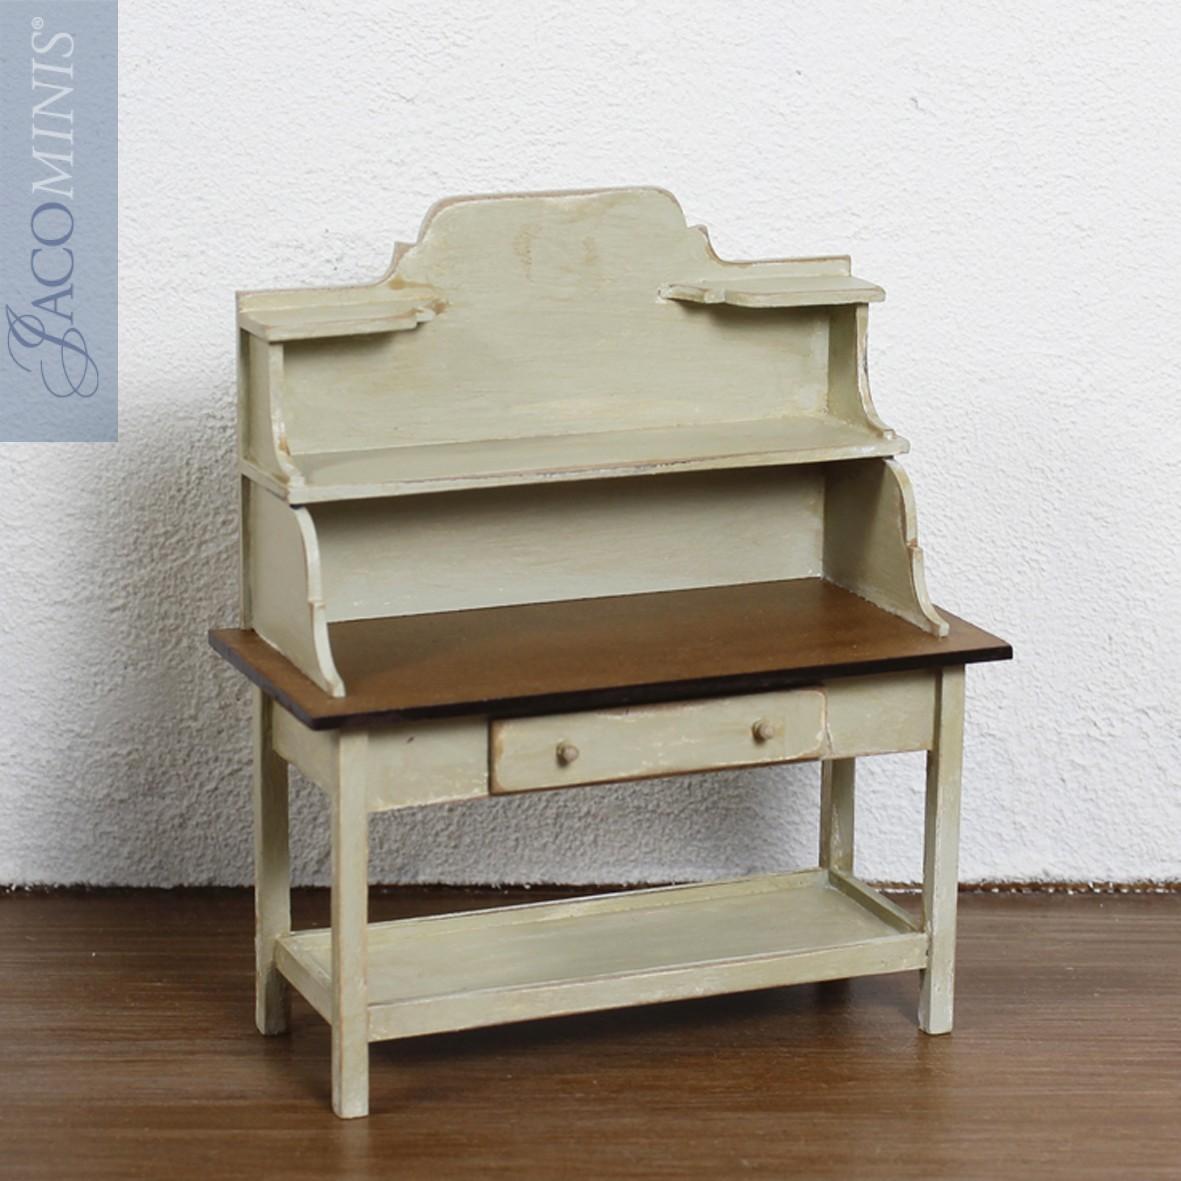 ViV 14 Tabletop Shelves Kit